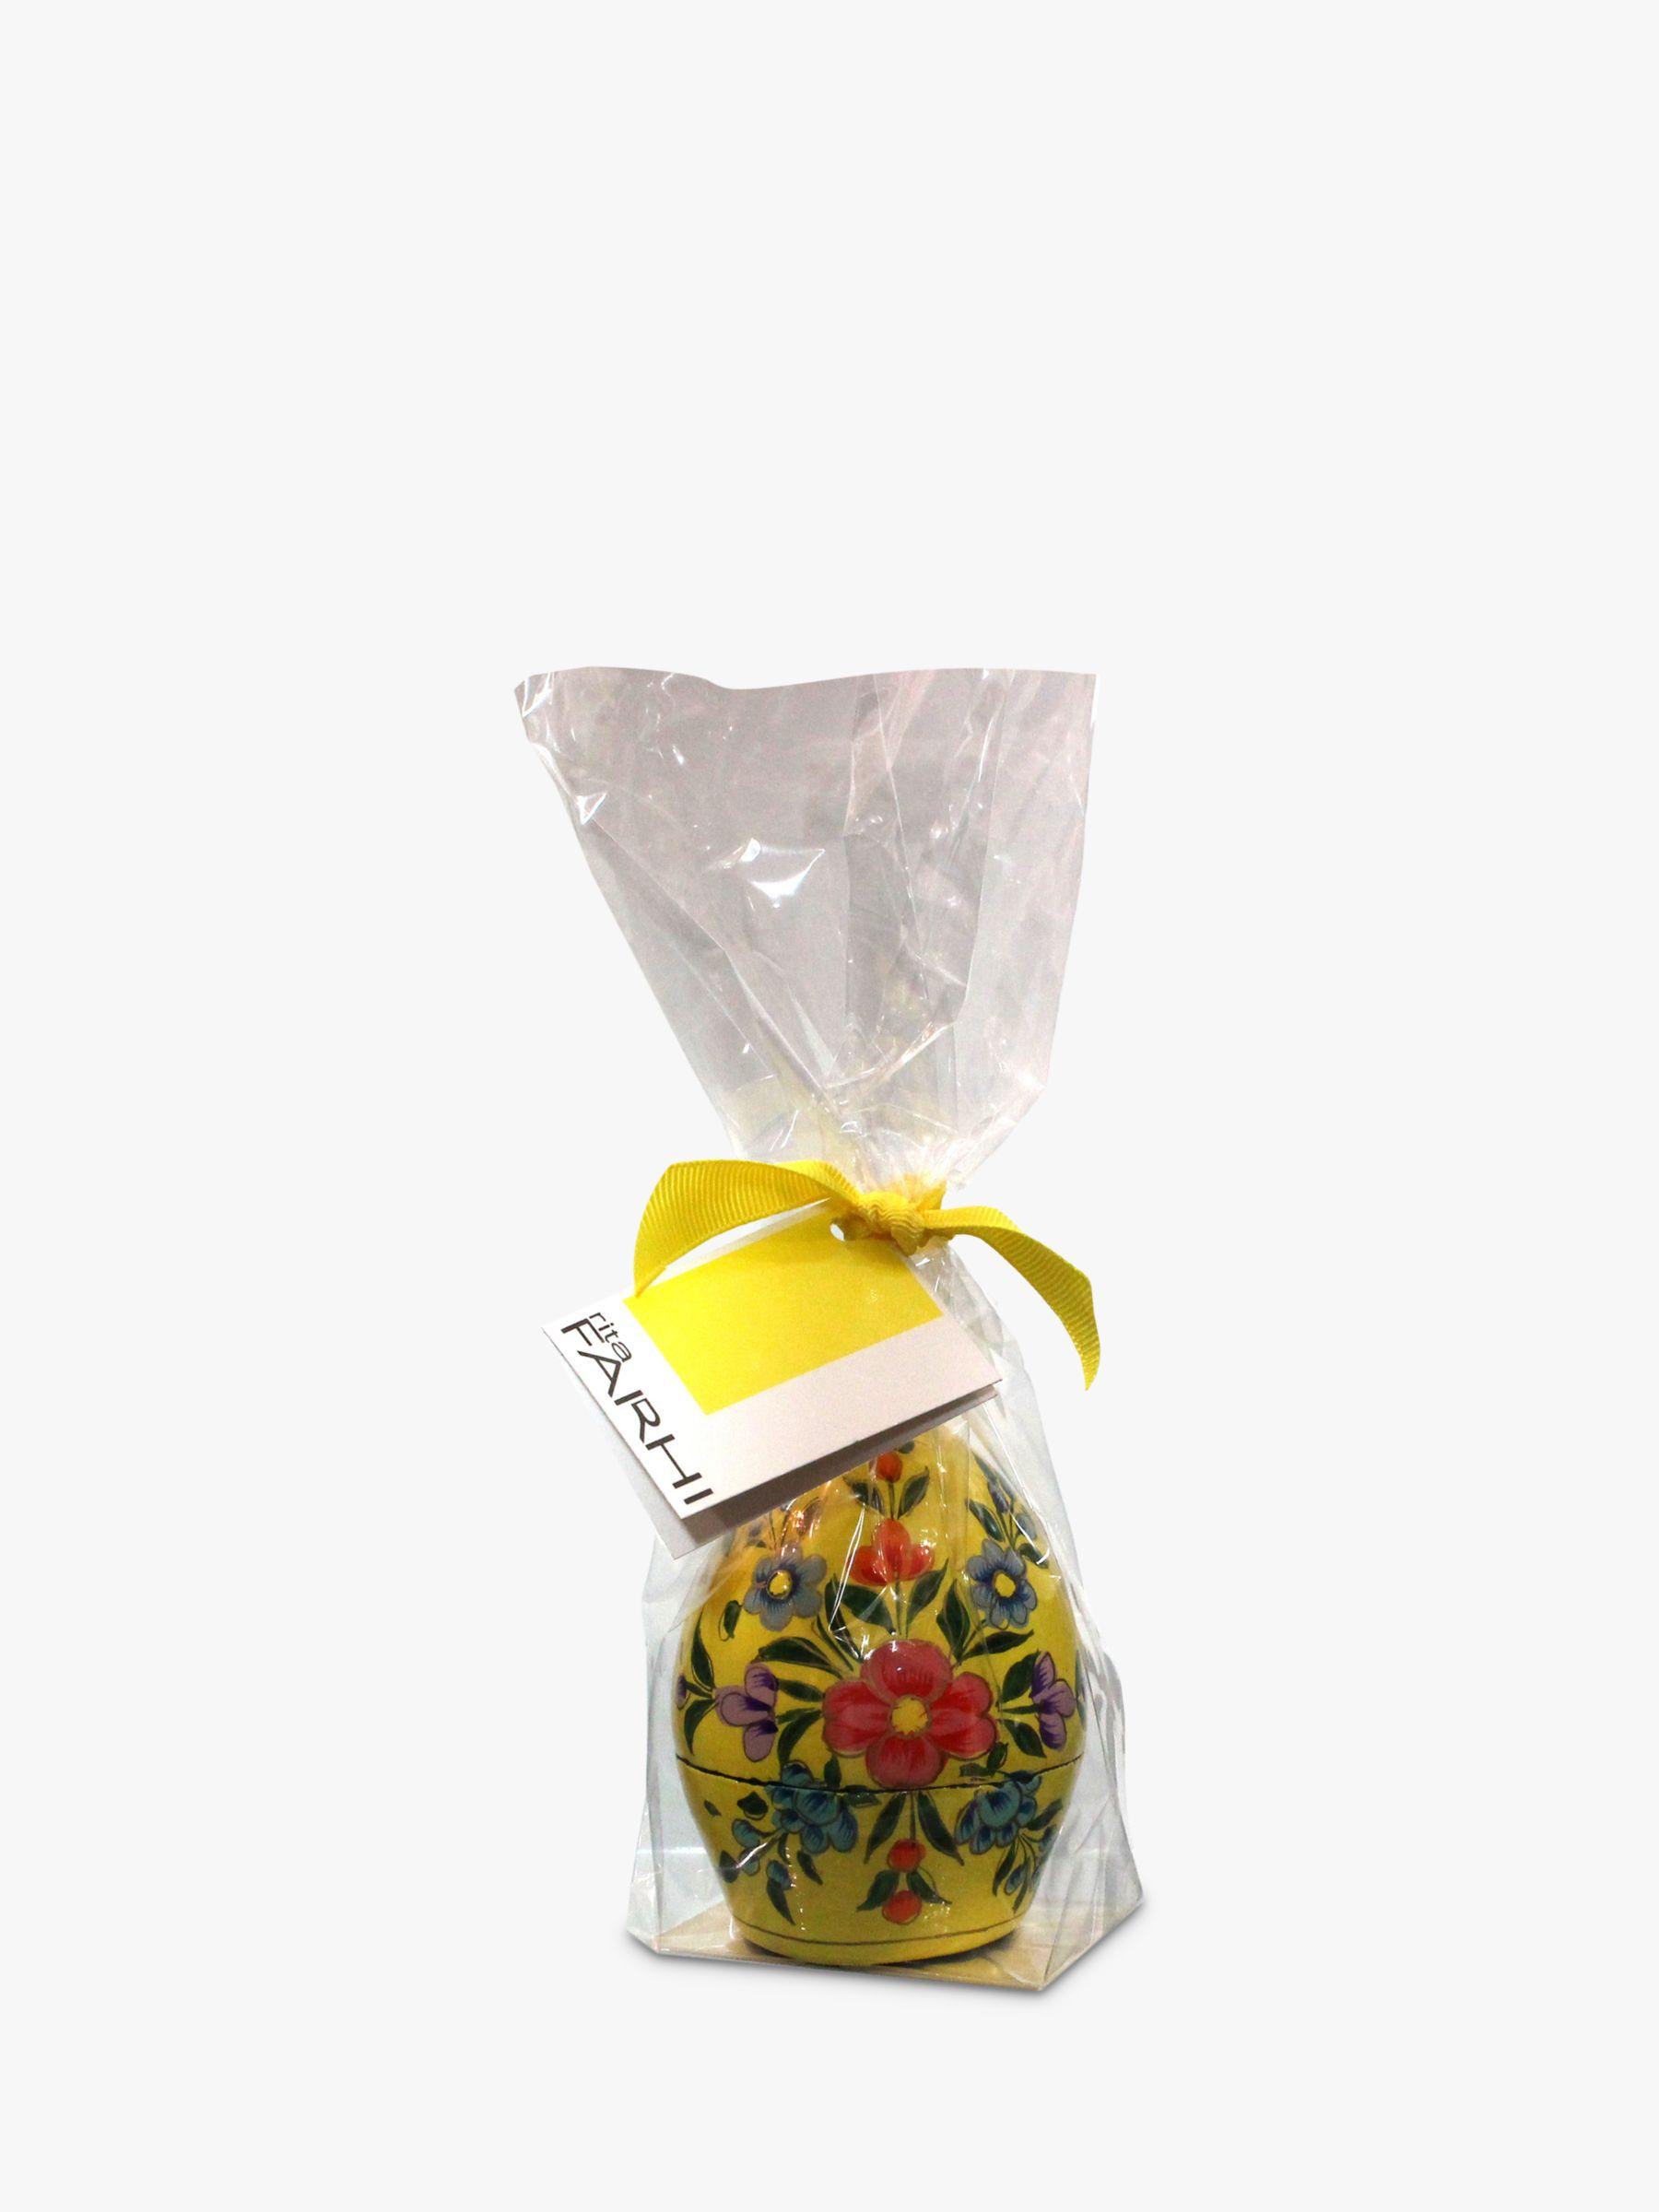 Farhi Farhi Papier Mache Easter Egg, Yellow, 40g